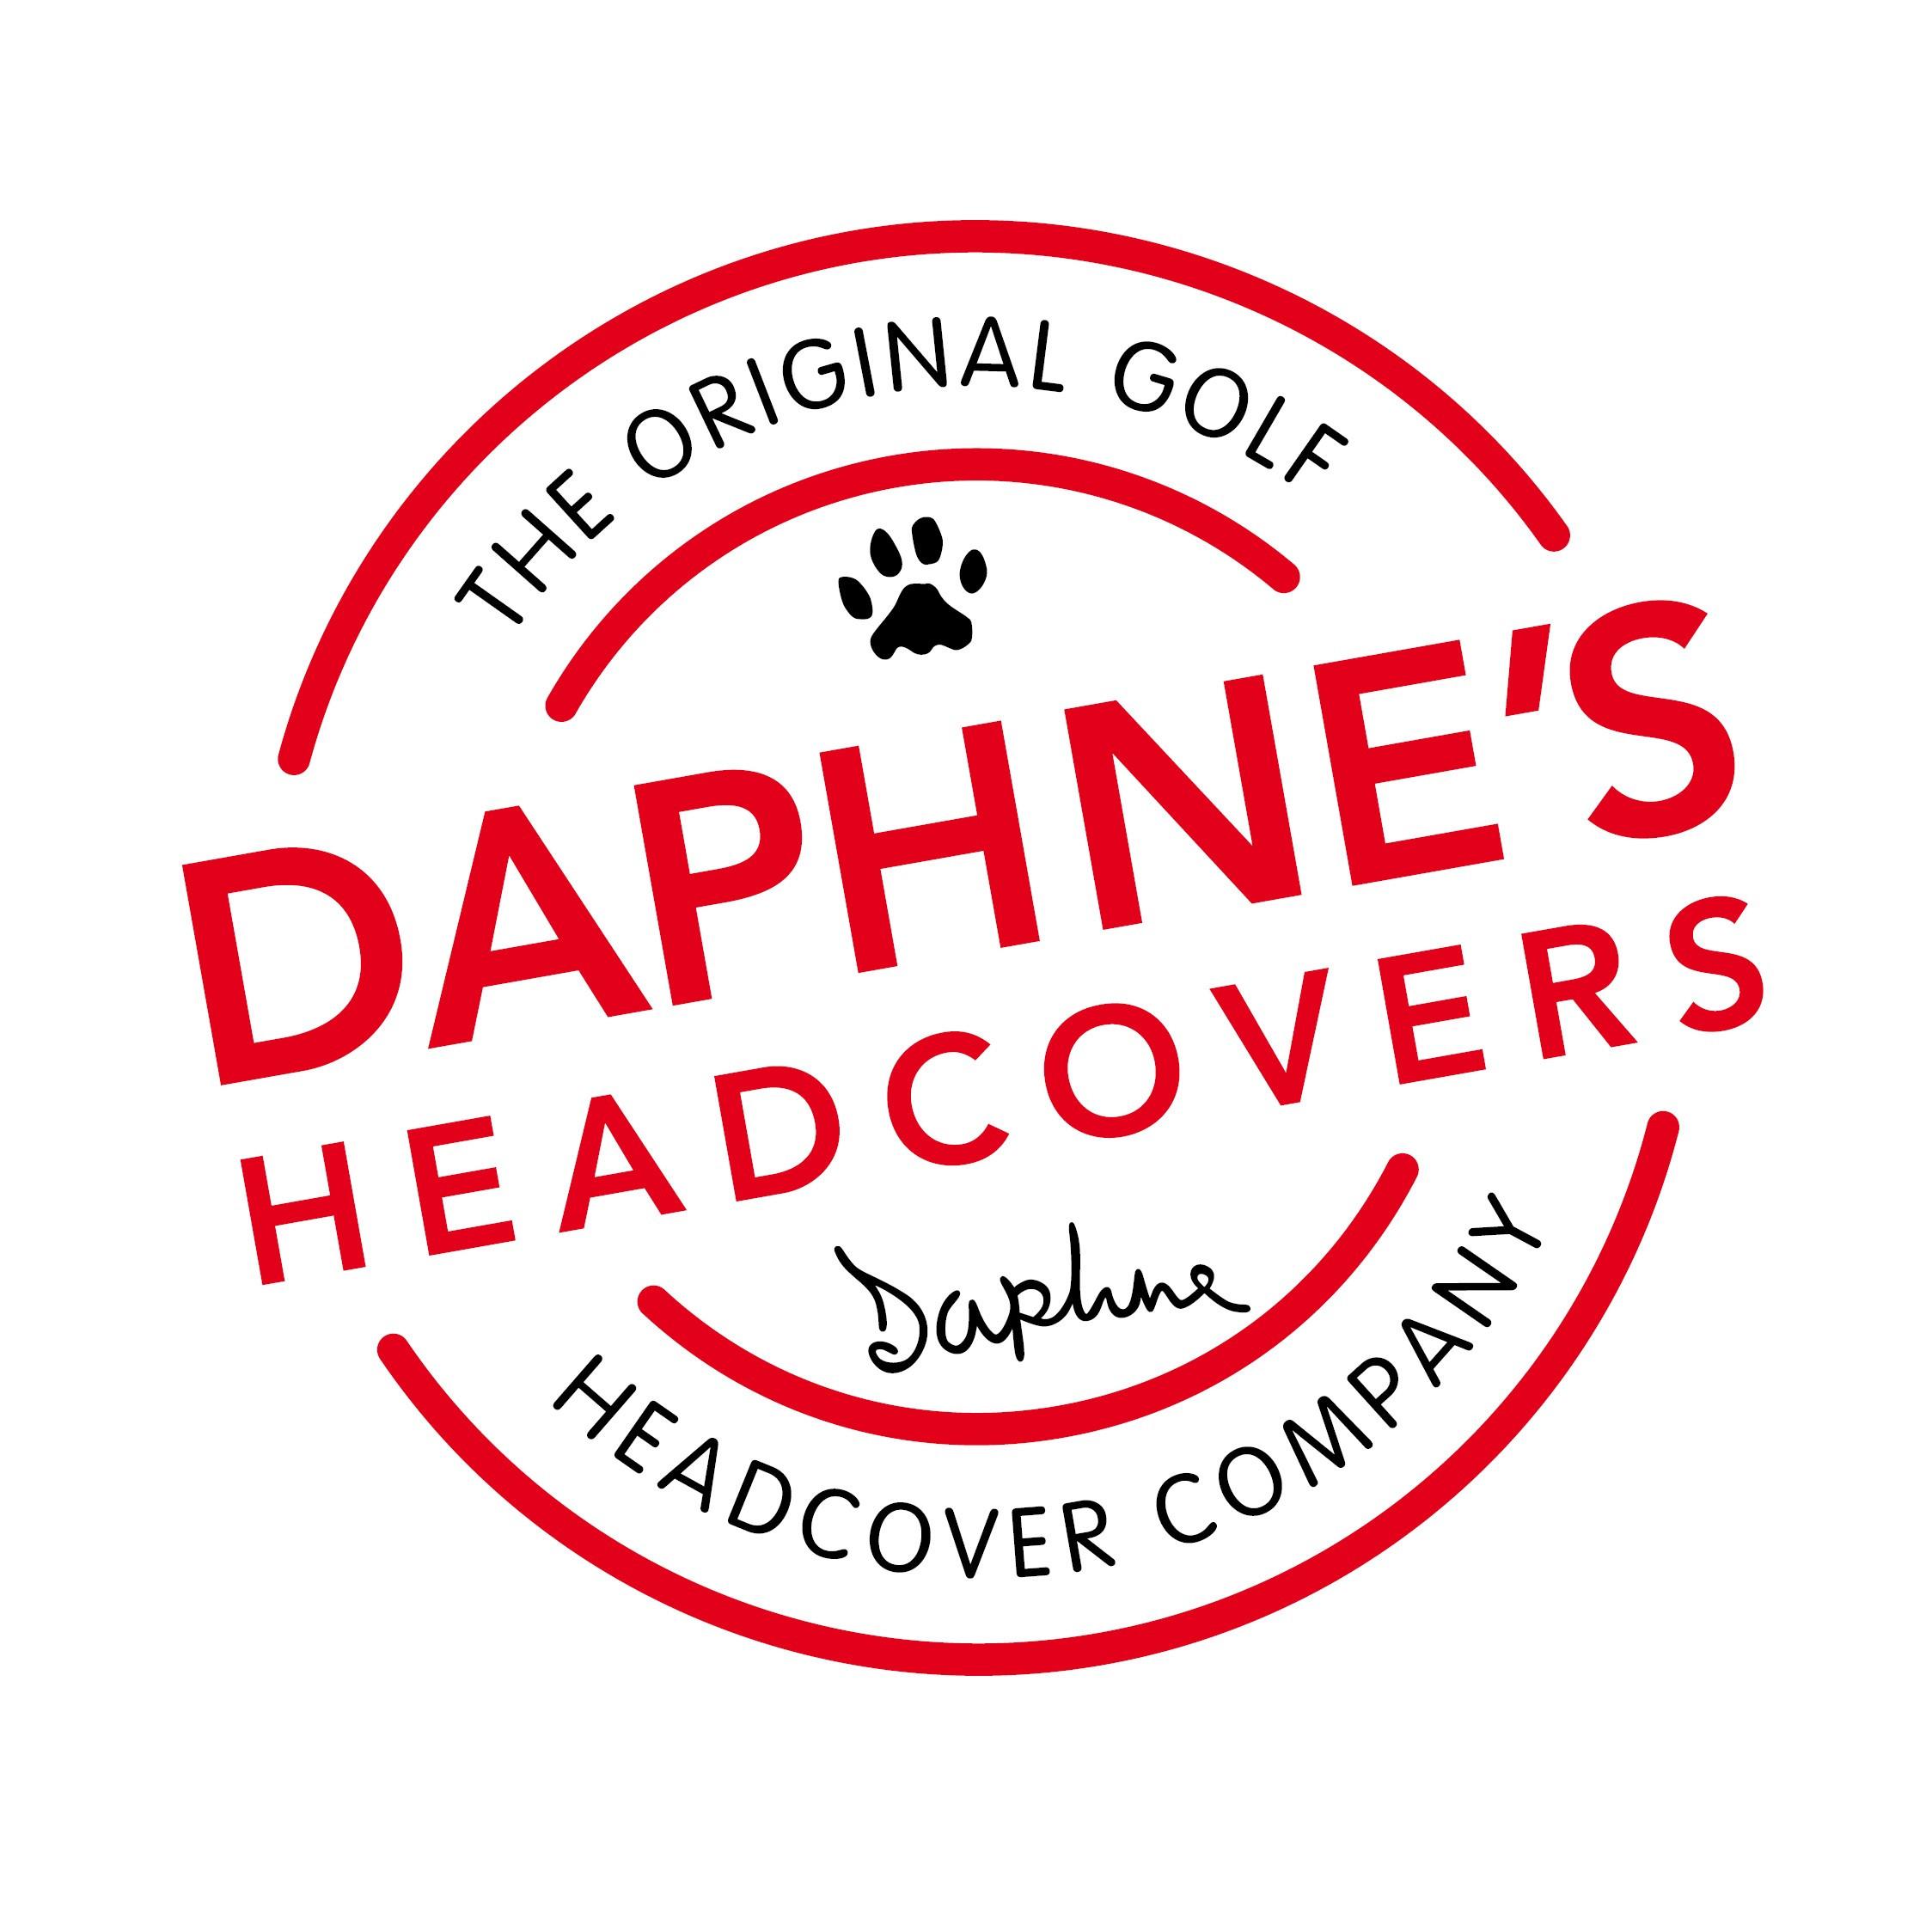 Daphne's Headcovers Logo